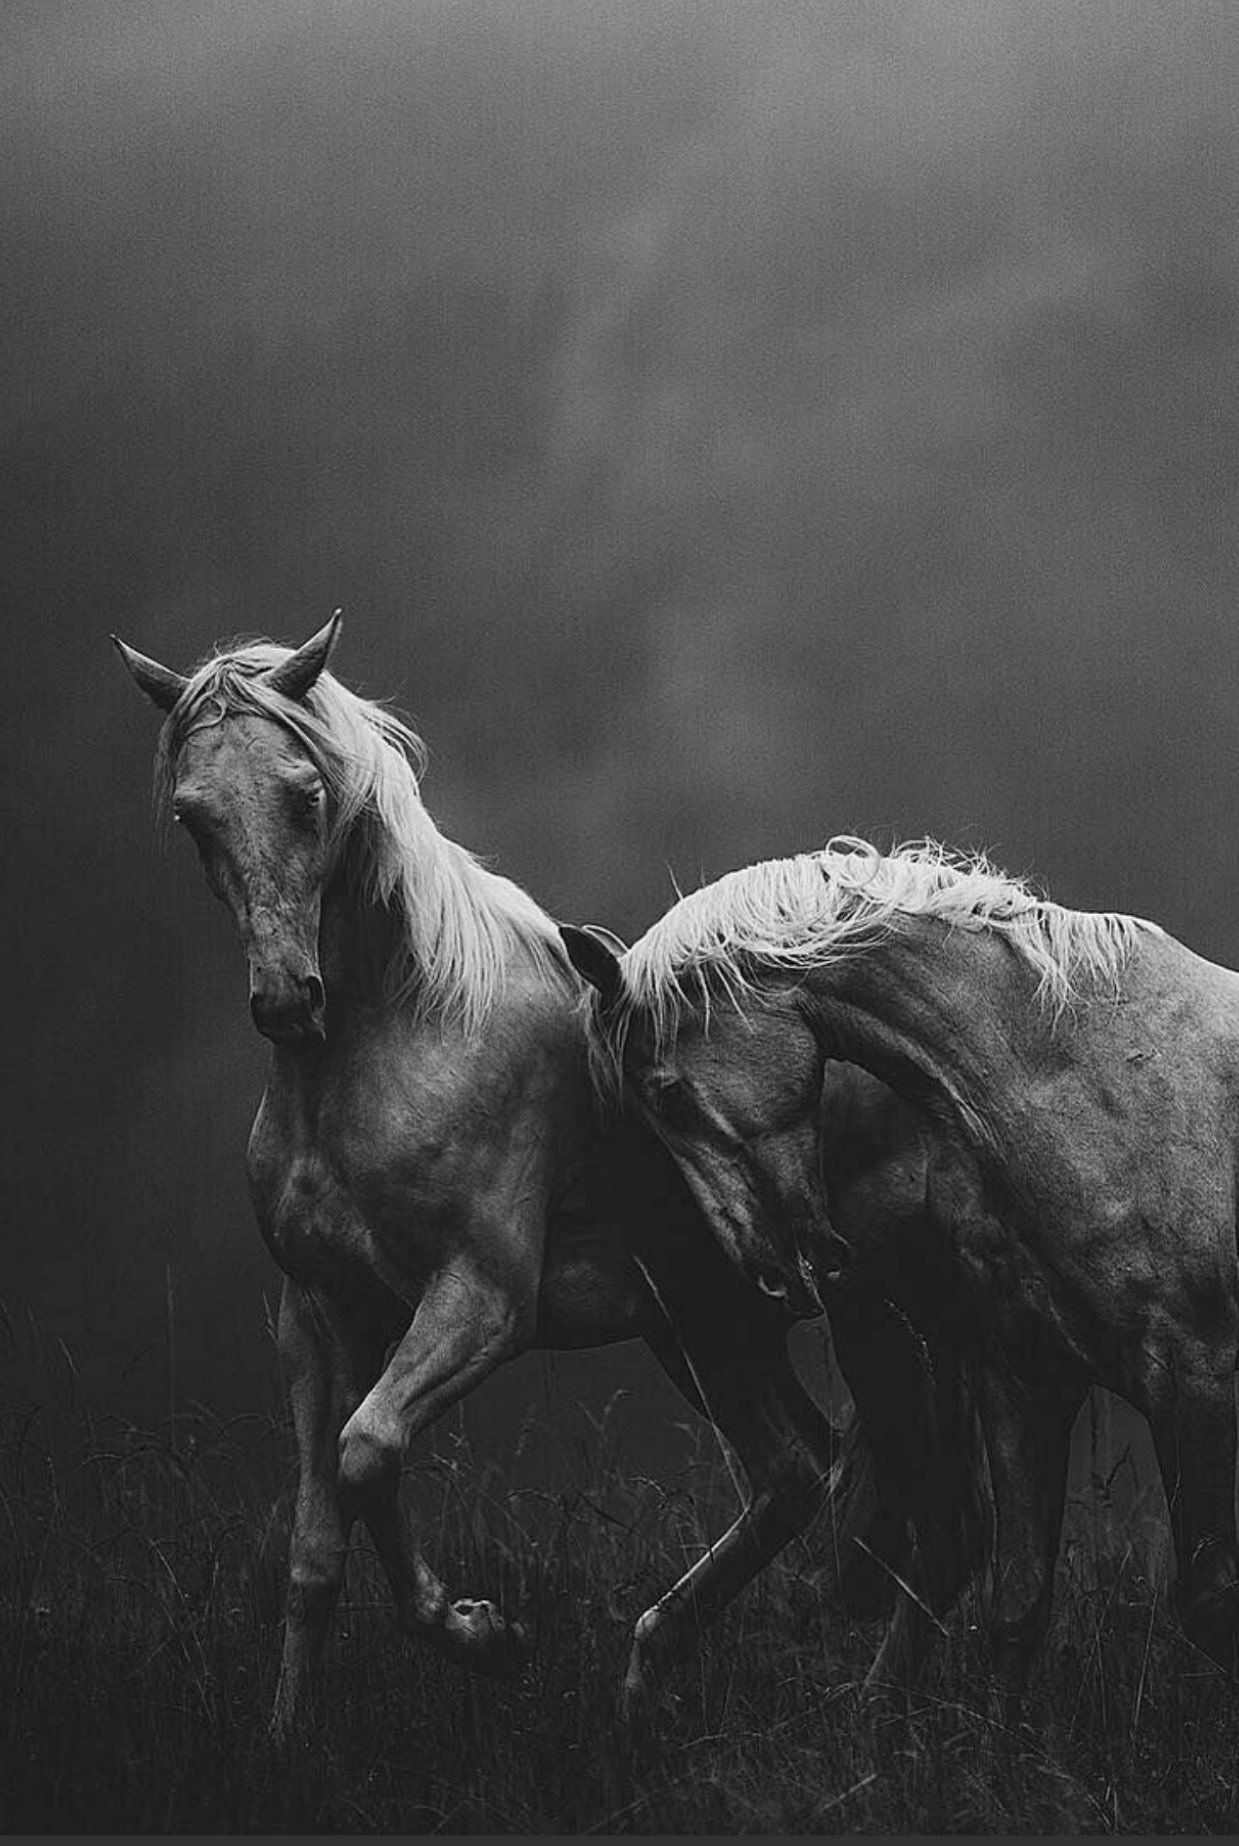 و إن ج ندن ا ل ه م الغ ال ب ون Horse Wallpaper White Horses Beautiful Horses